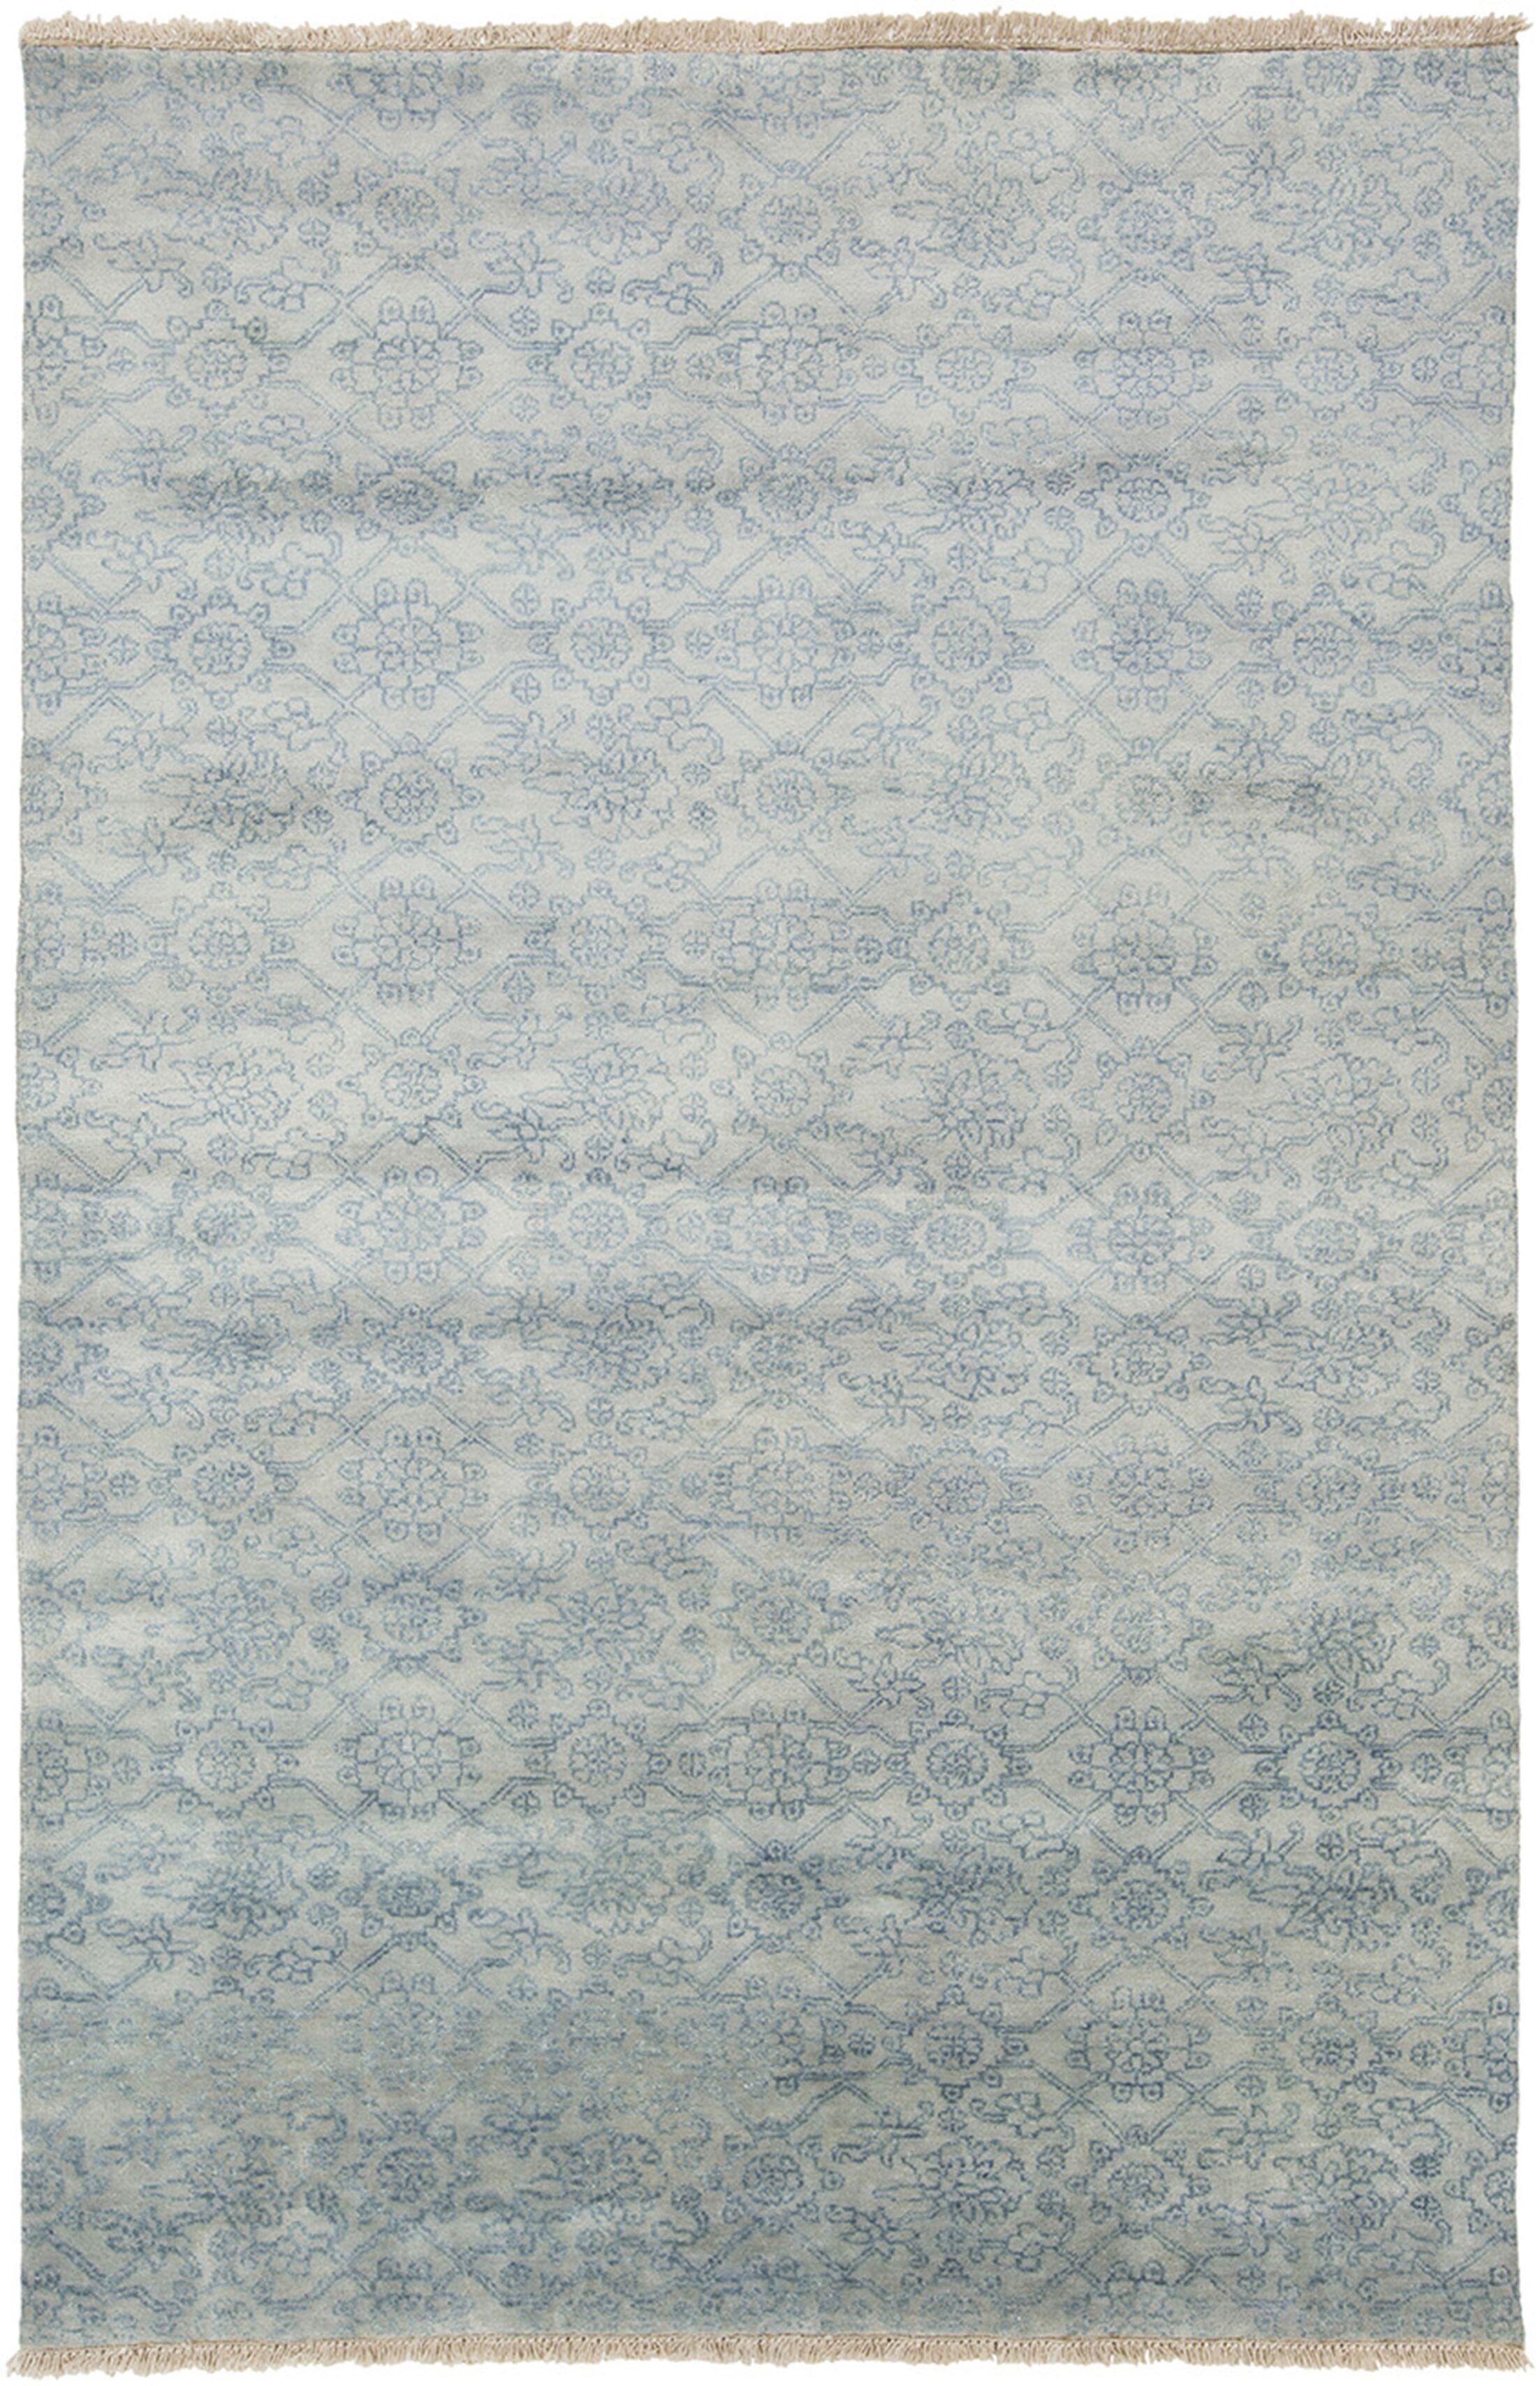 Harrisville Slate/Light Gray Area Rug Rug Size: Rectangle 5'6